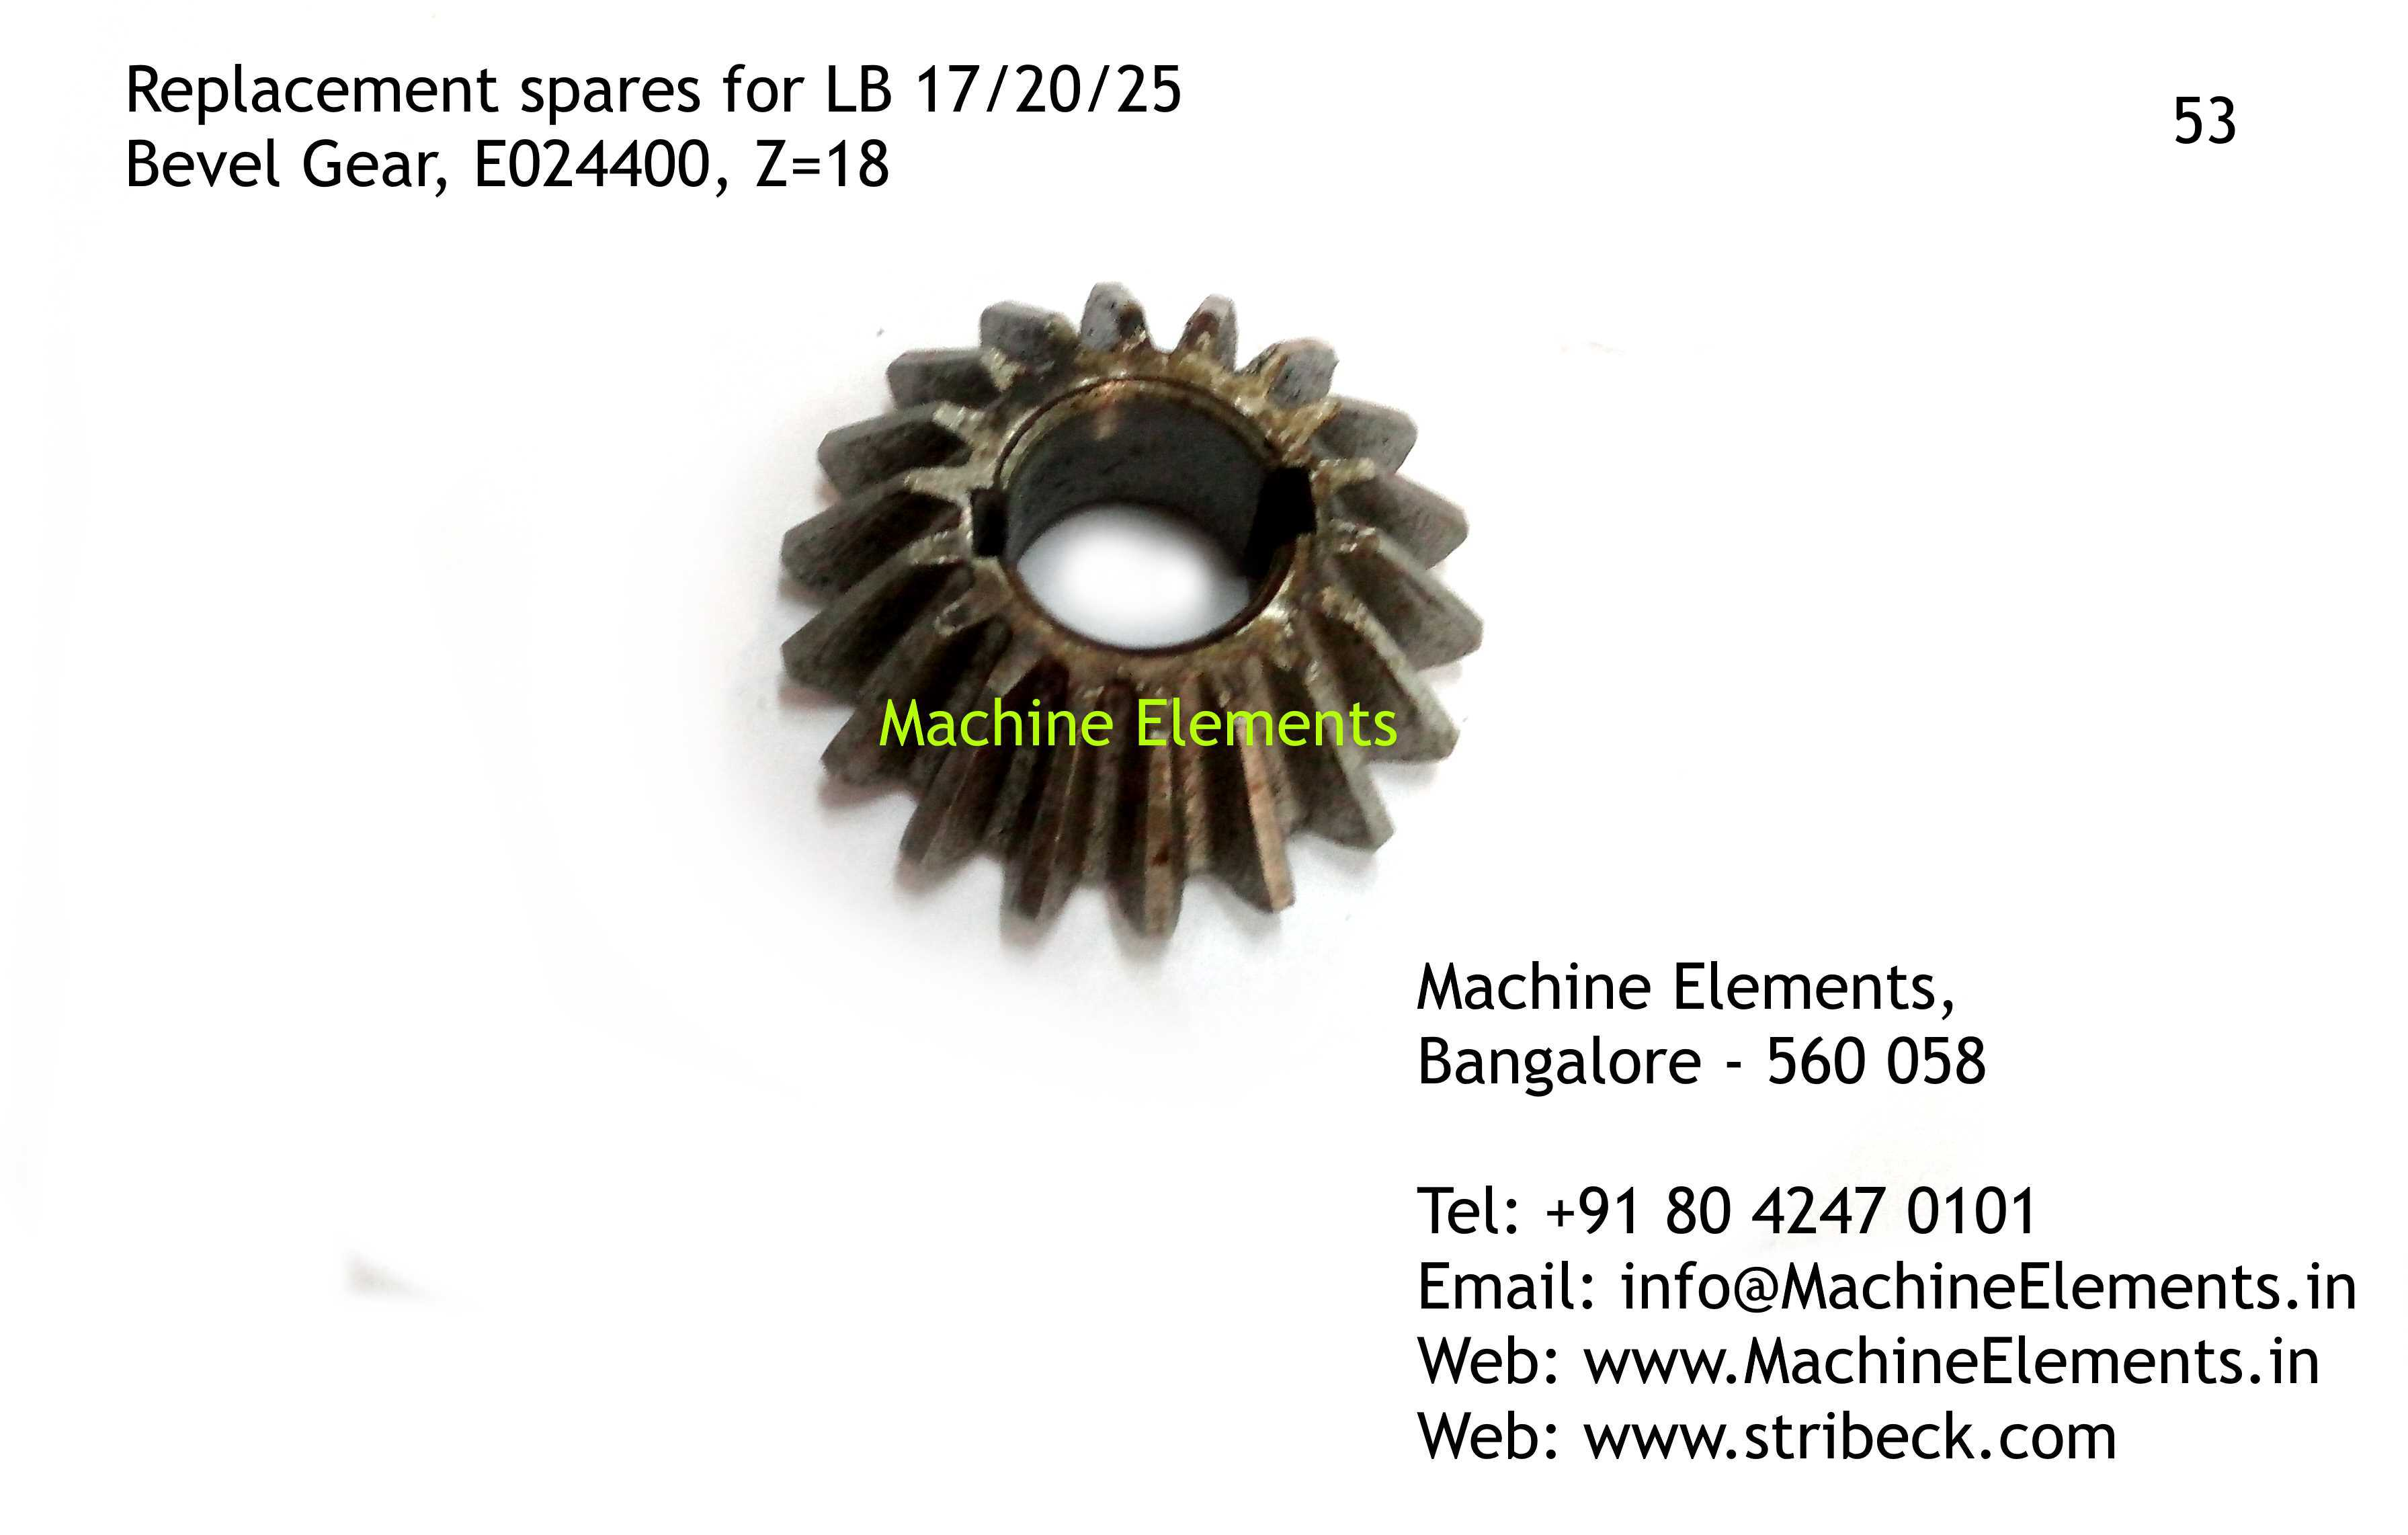 Bevel Gear, E024400, Z=18